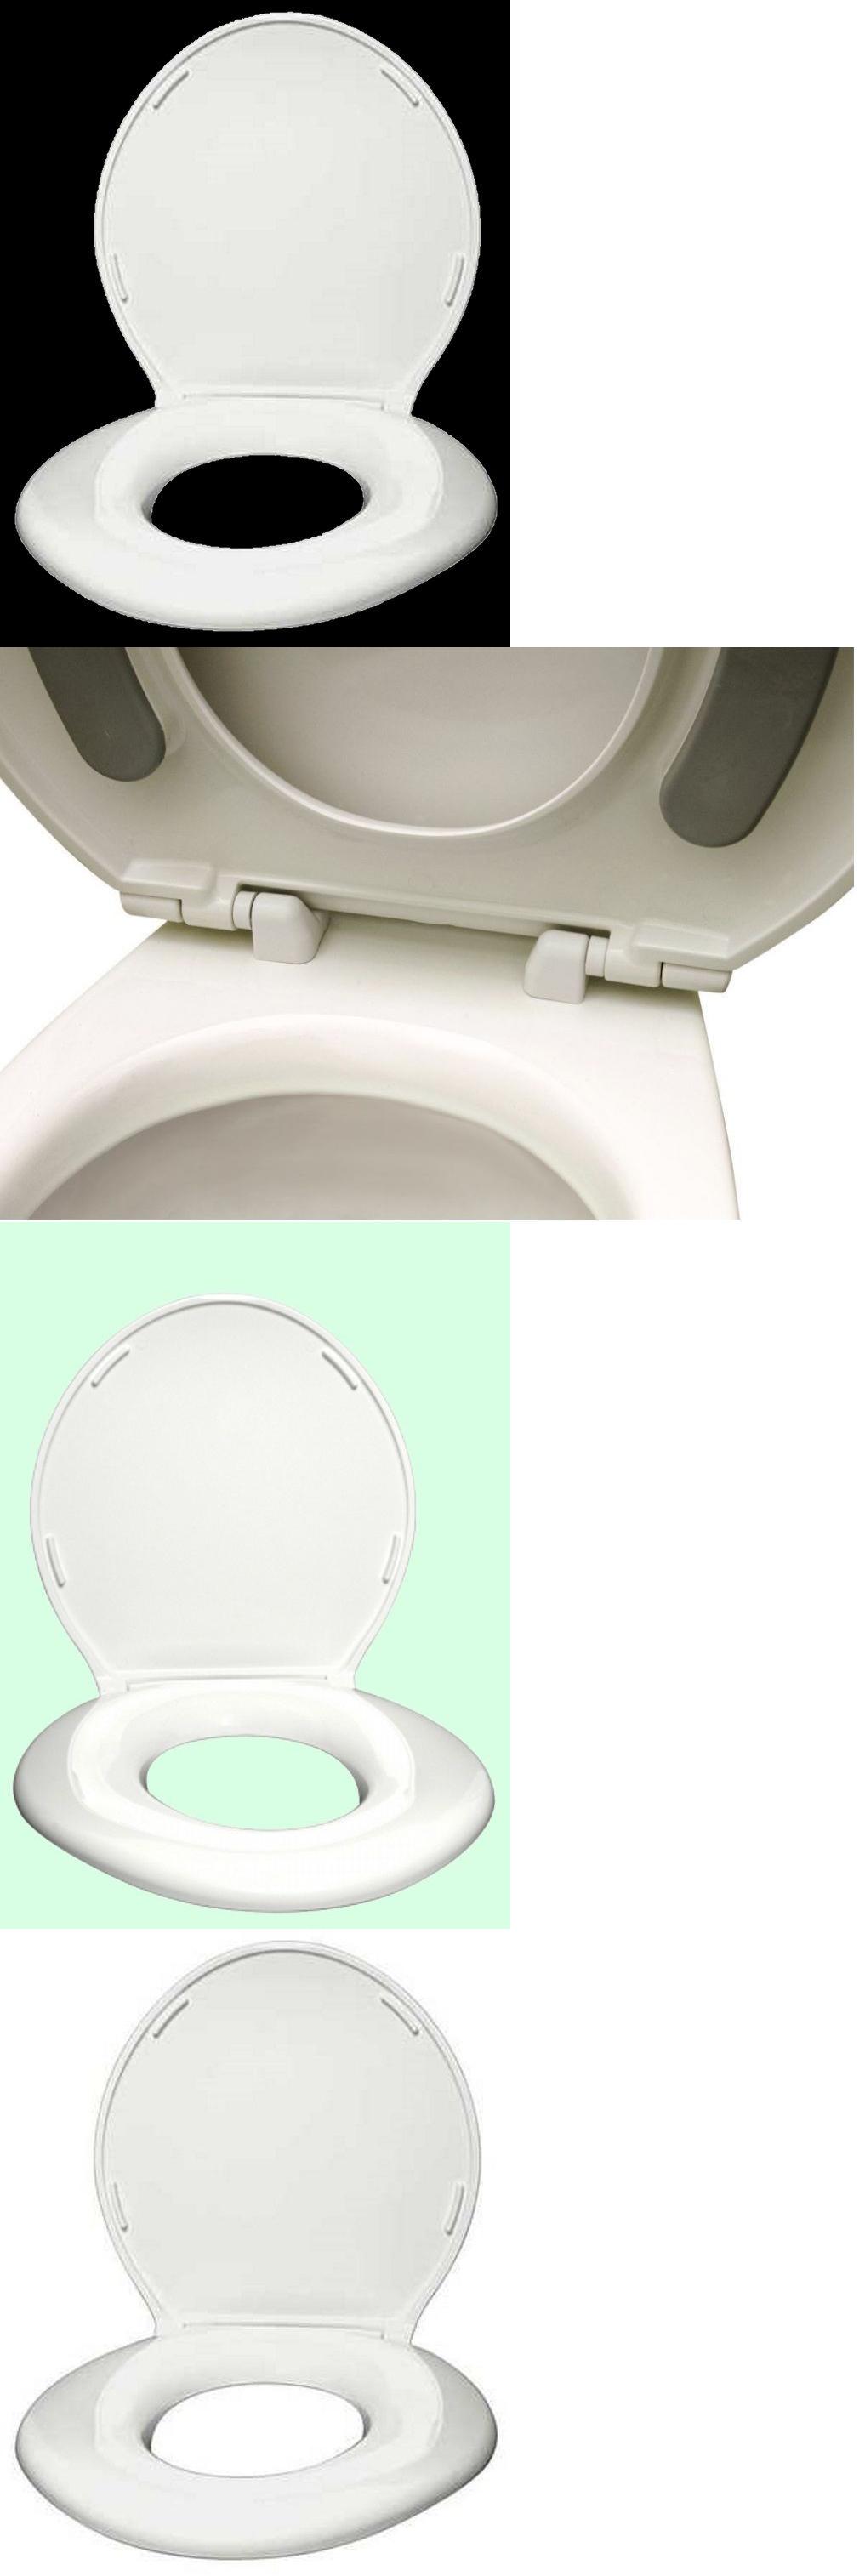 other accessibility fixtures 800 lb capacity toilet seat big john